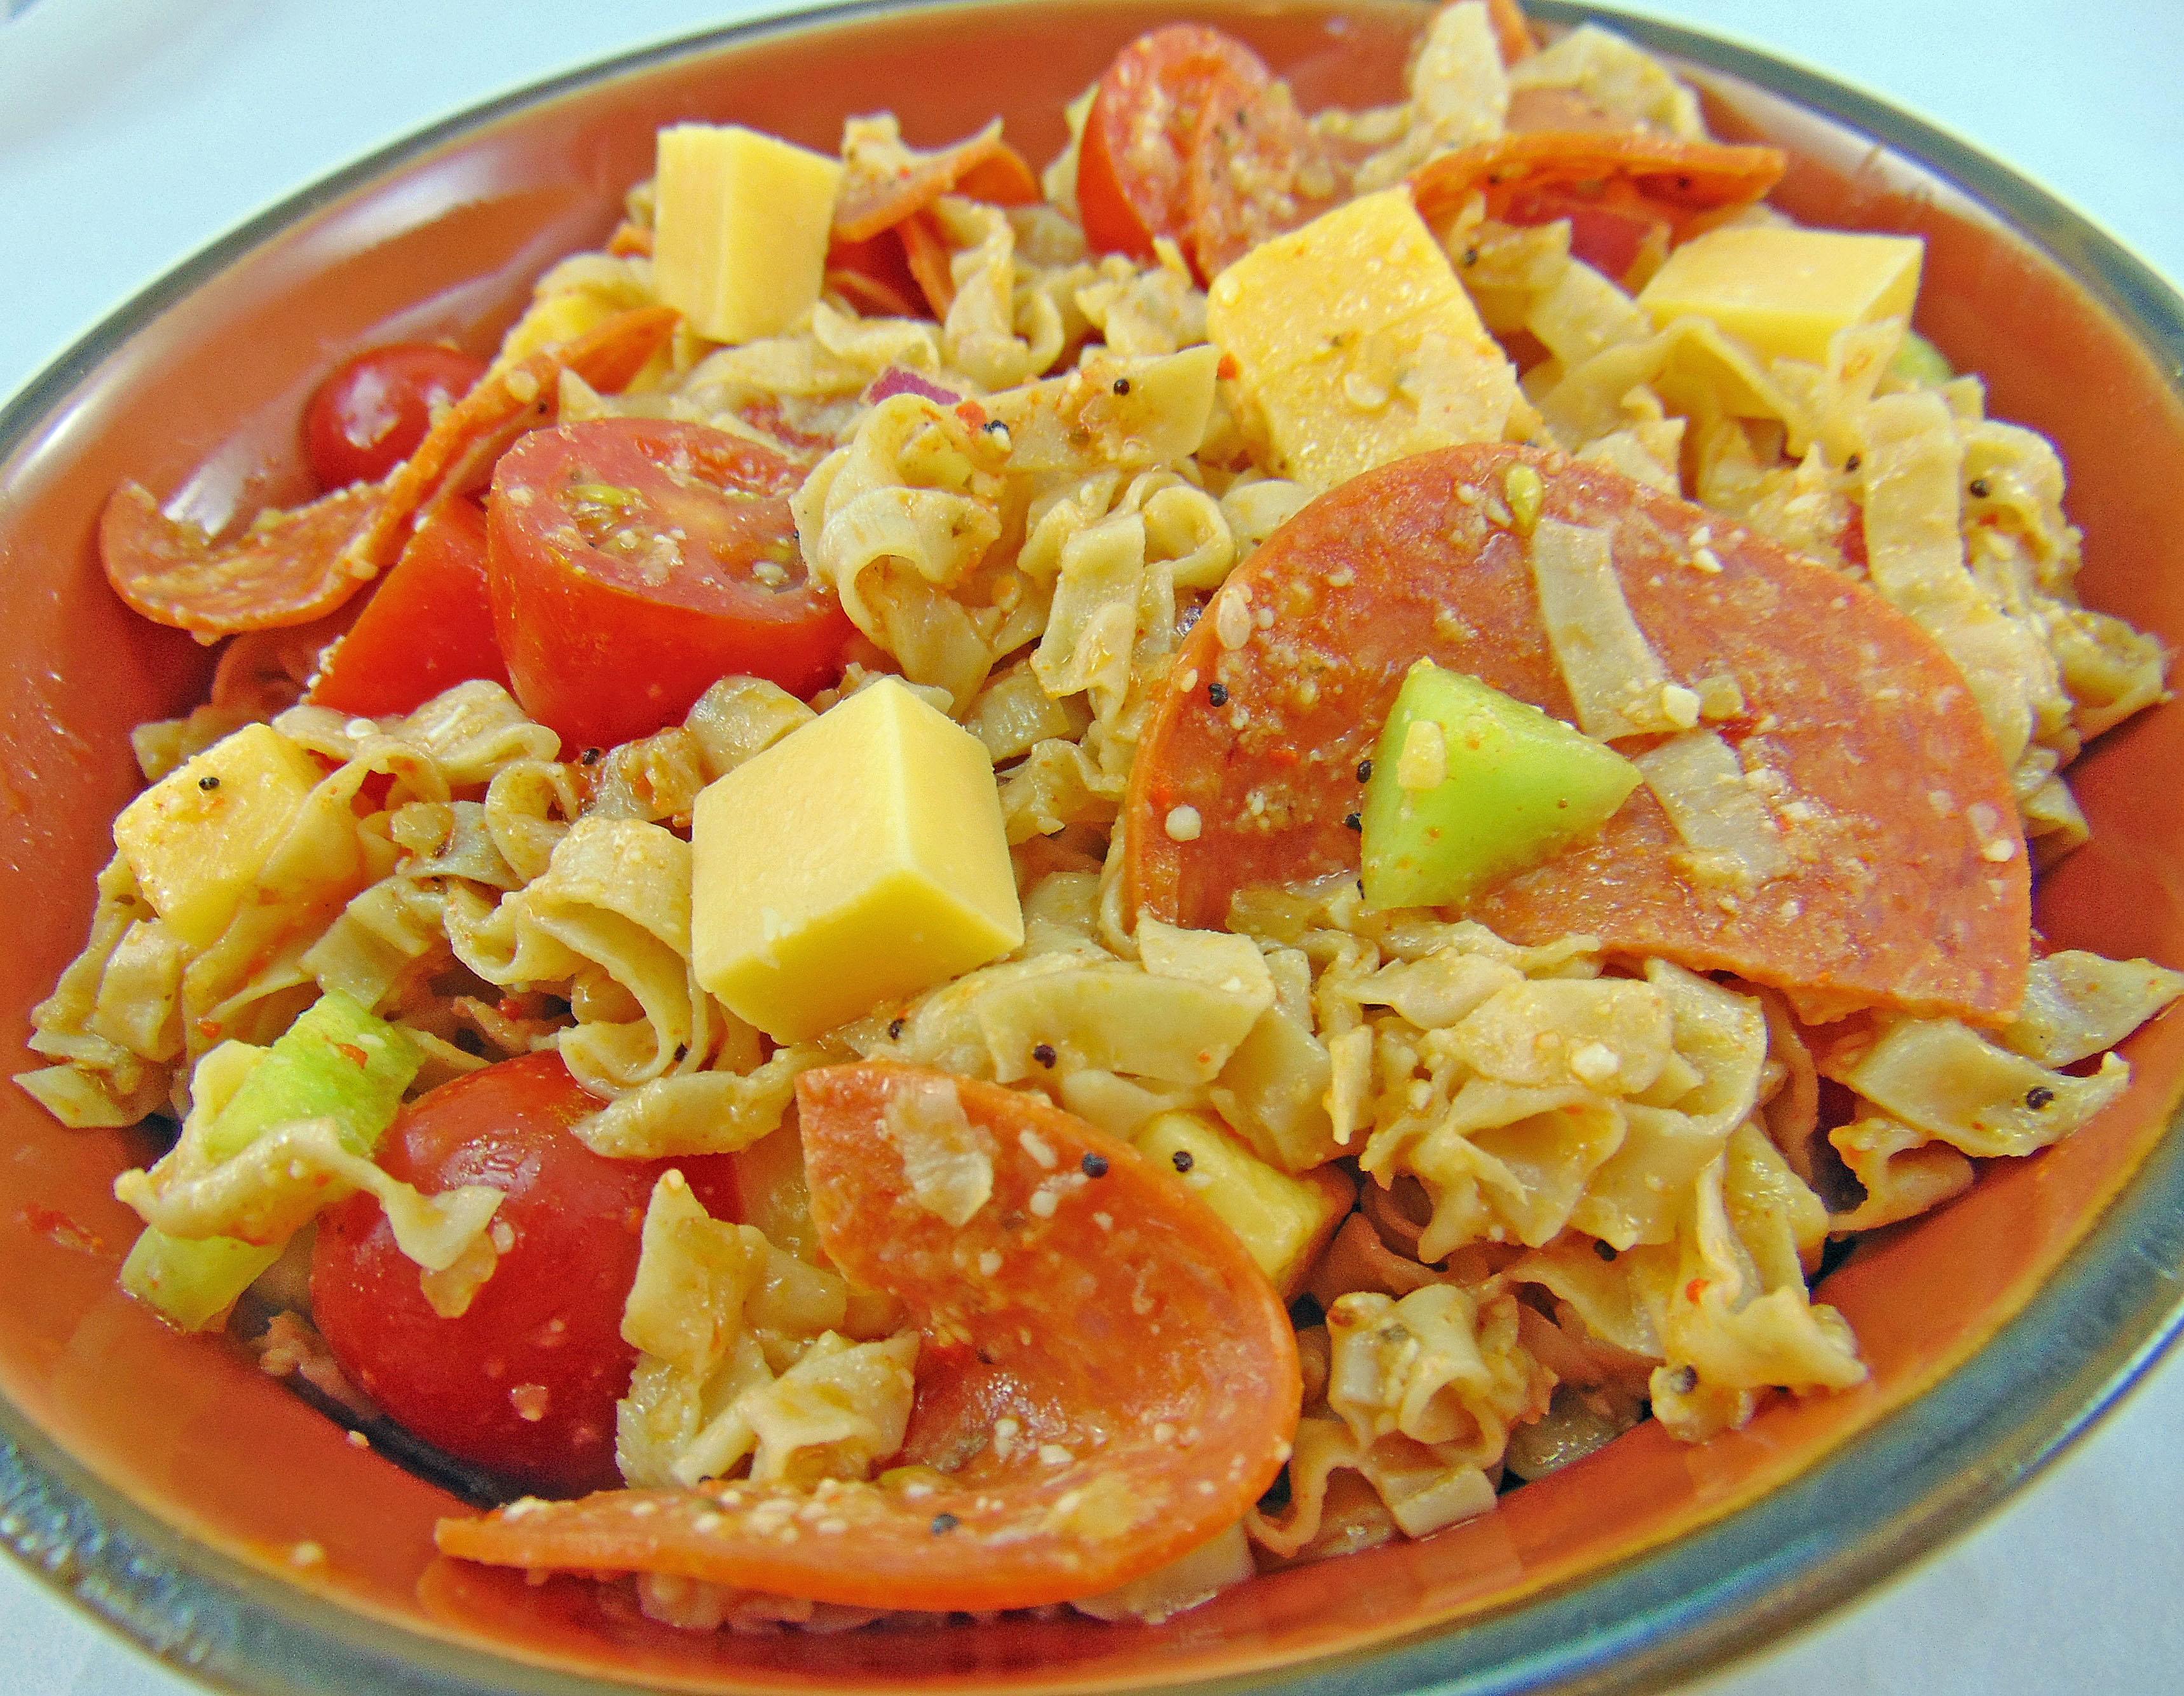 Thumbnail for Low Carb Summer Picnic Pasta Salad